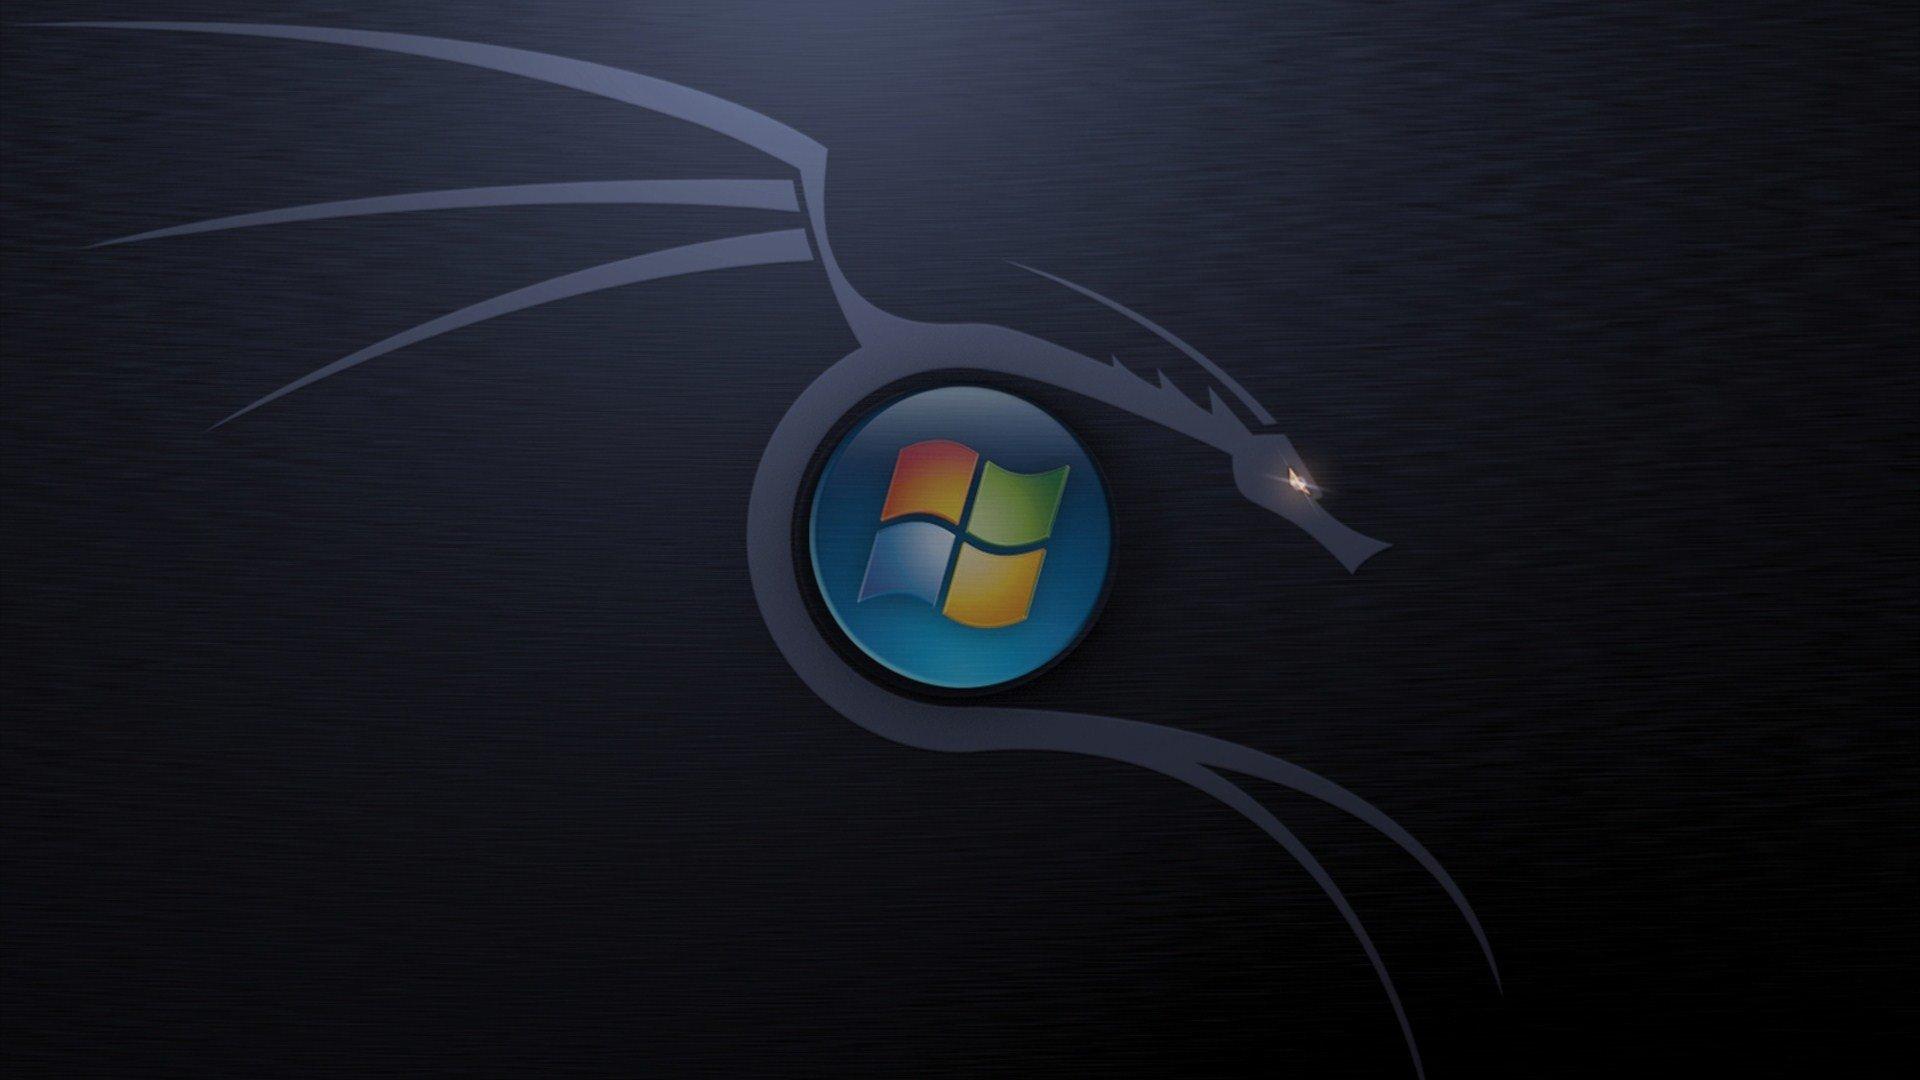 linux hacker background - photo #21